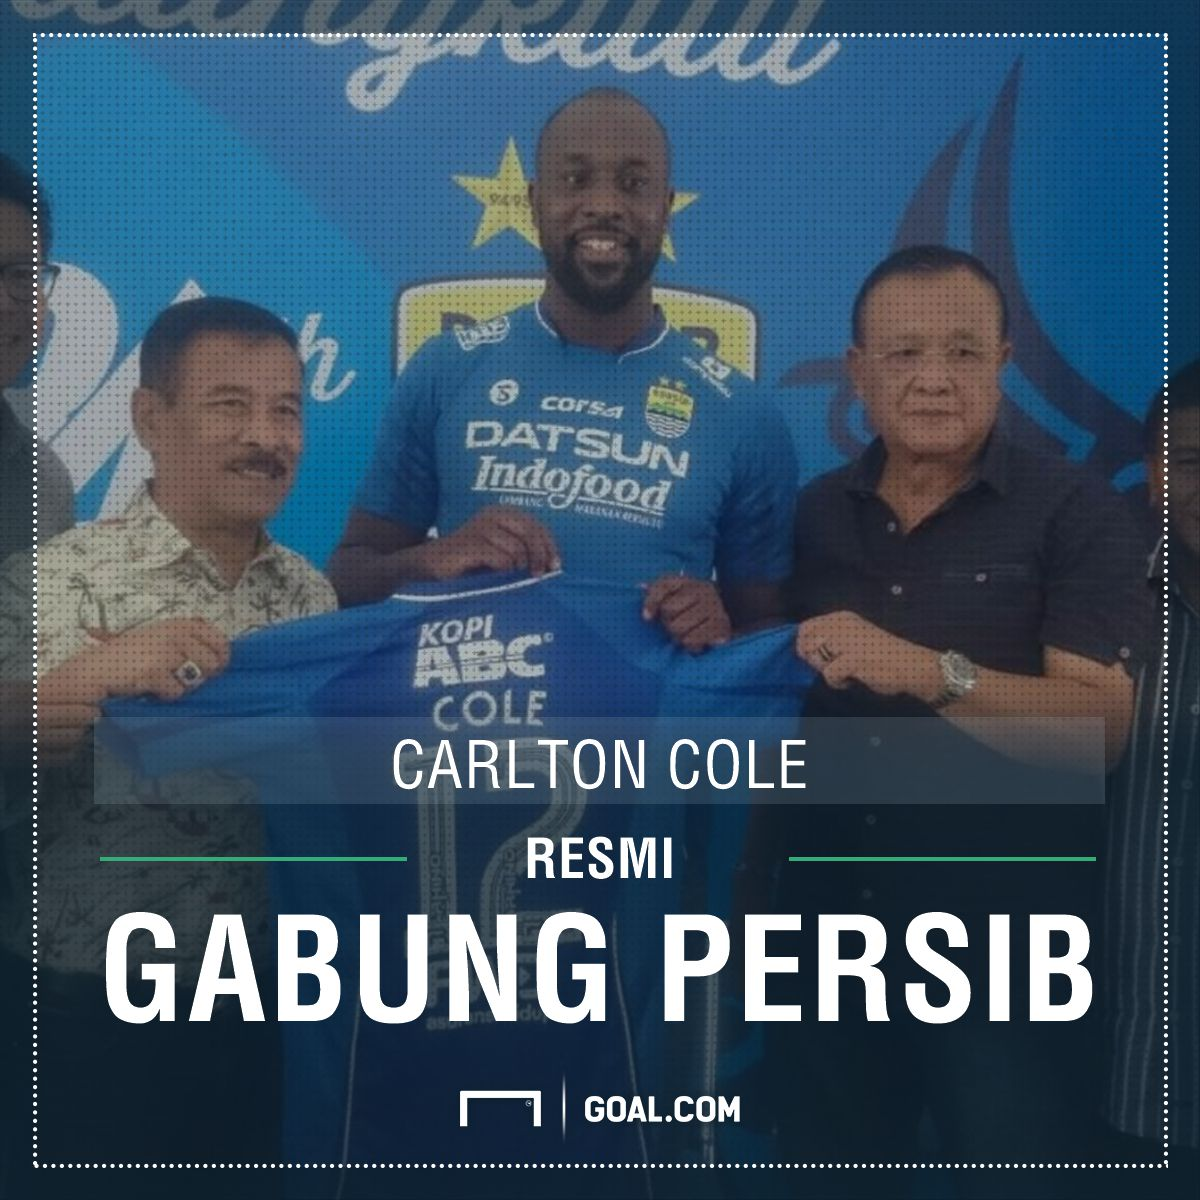 RESMI: Carlton Cole Merapat Ke Persib Bandung - https://t.co/VS4IgkmEj...